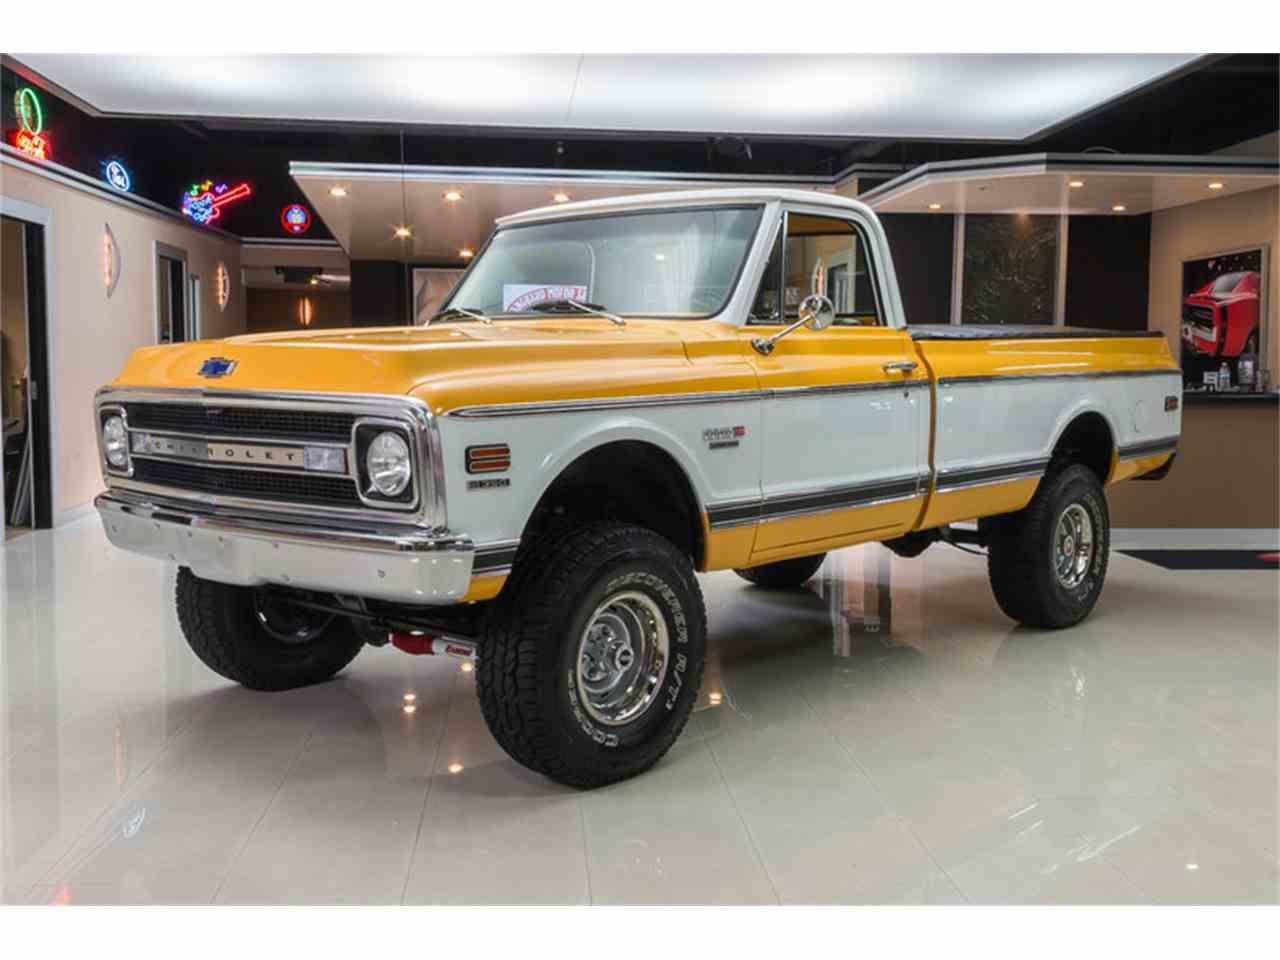 1970 chevrolet k 10 cheyenne 4x4 pickup for sale cc 876226. Black Bedroom Furniture Sets. Home Design Ideas